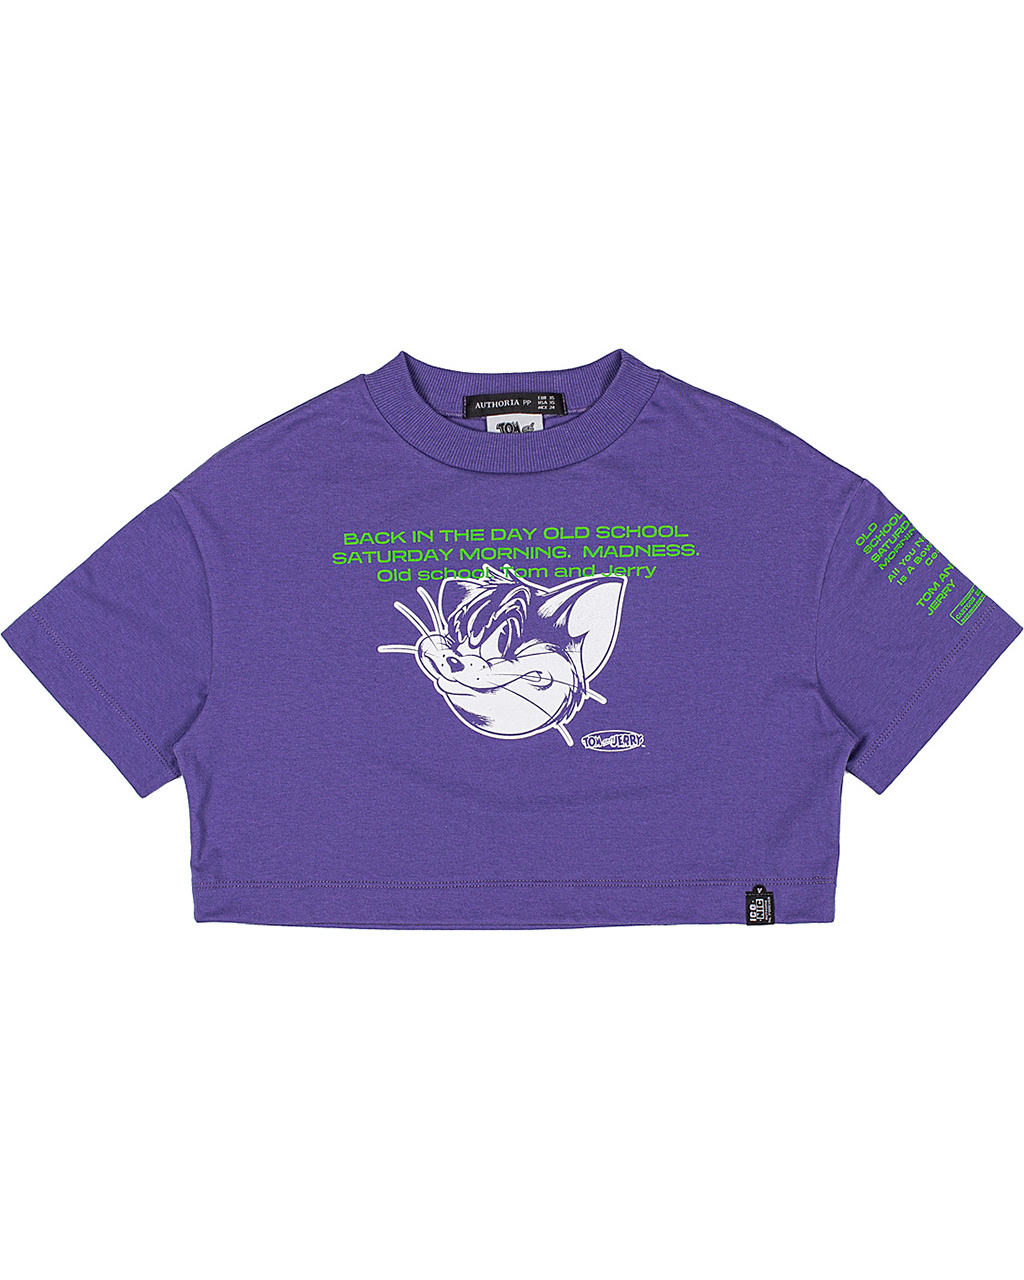 T-Shirt Teen Jerry Roxa Authoria